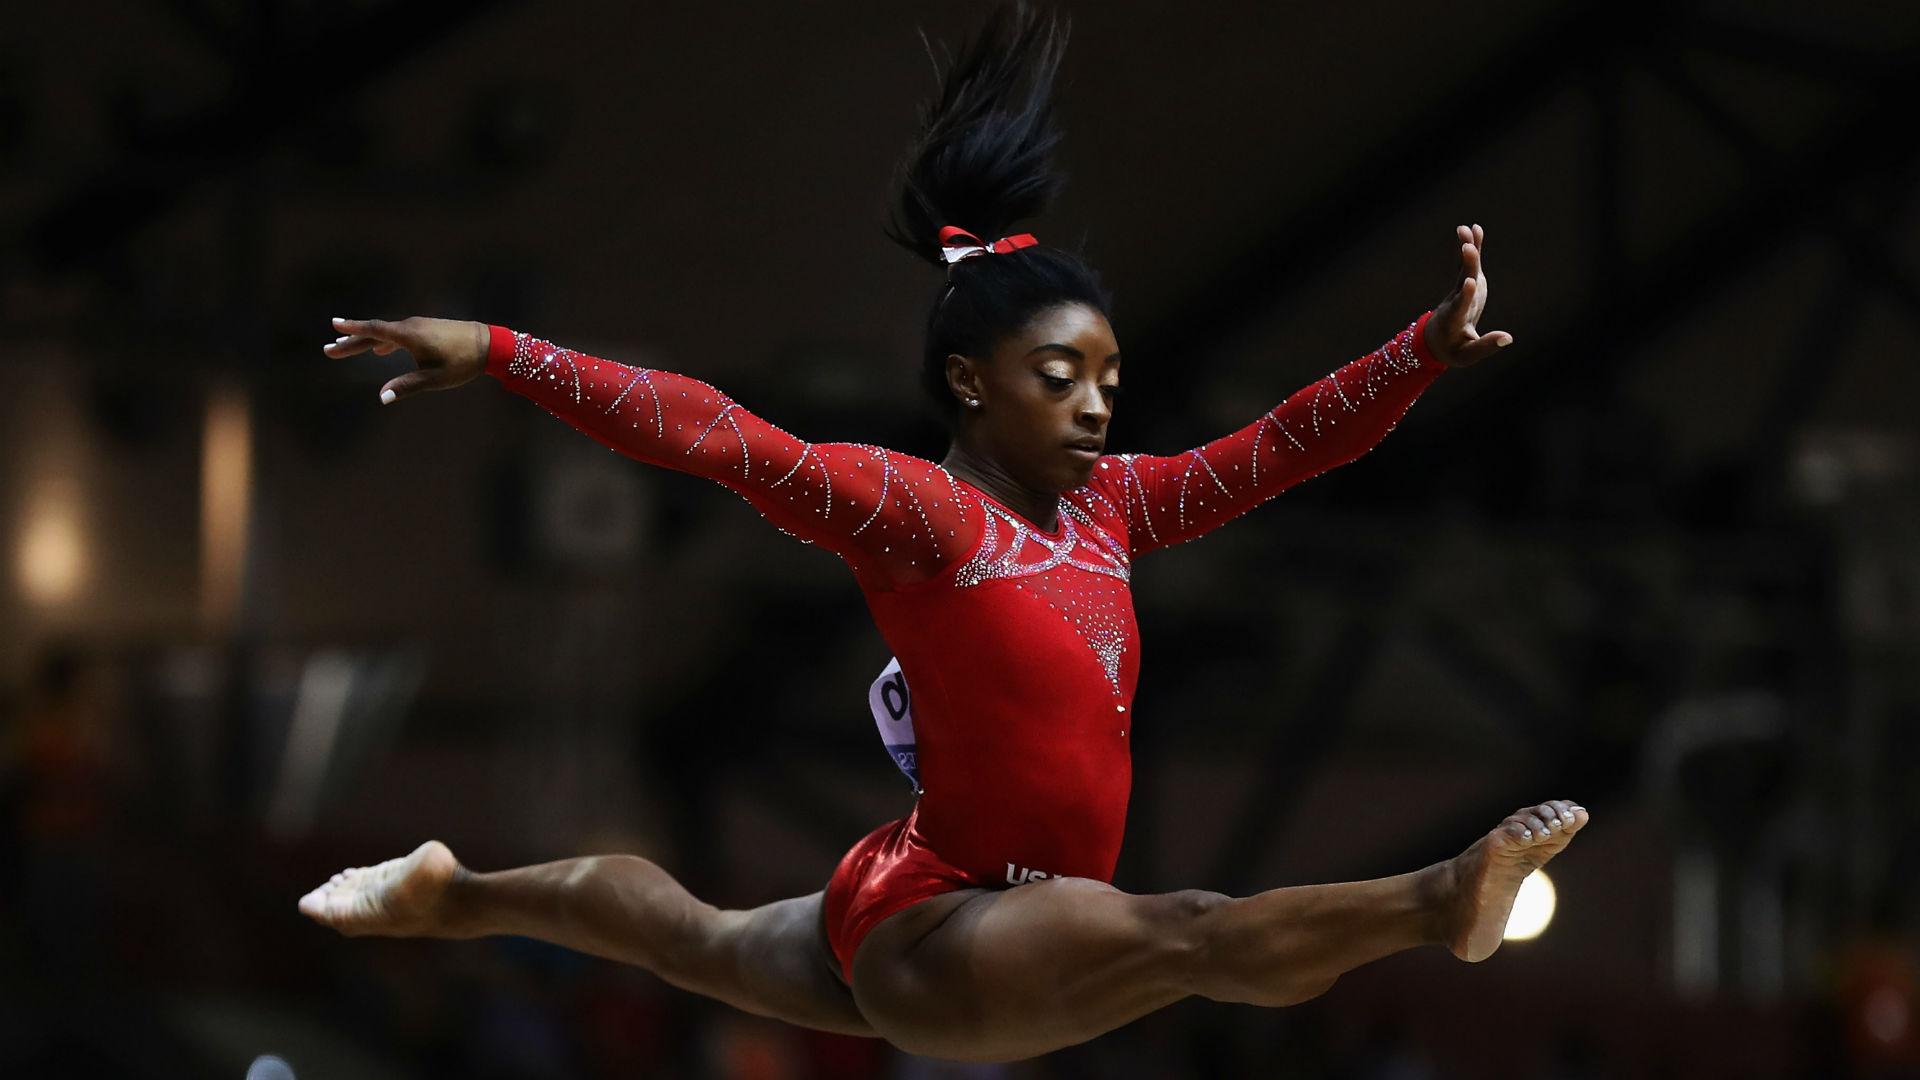 Simone Biles on DAZN: How to watch, live stream The Superstars of Gymnastics